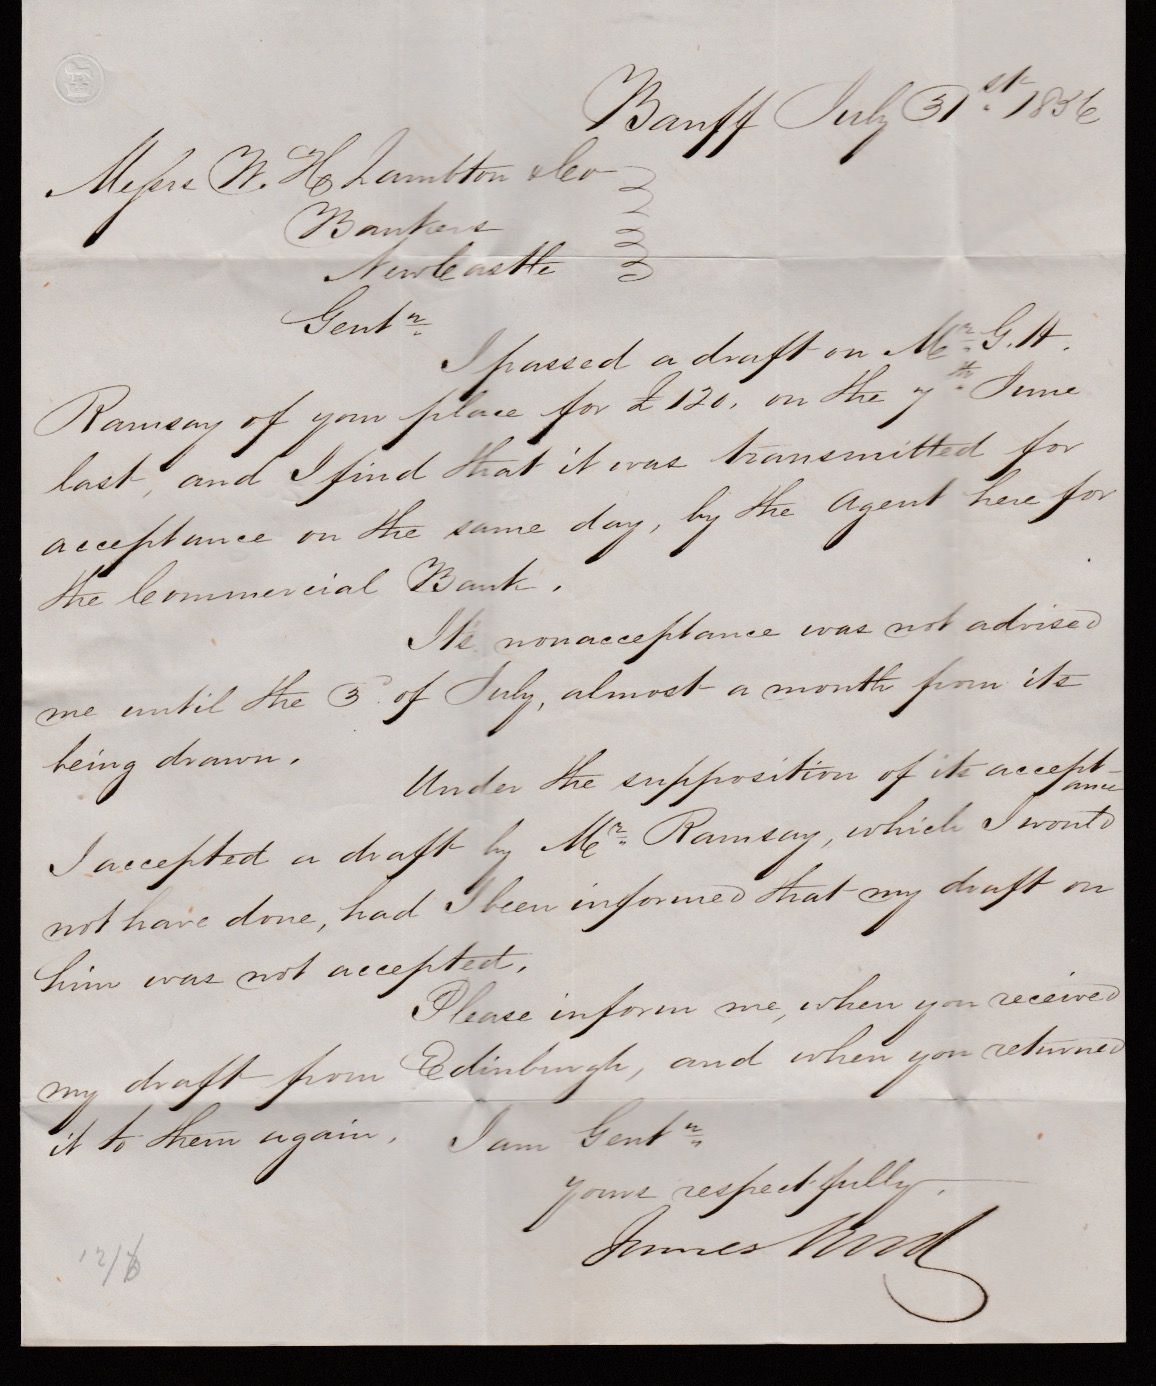 G.B. - Ireland 1856 - Image 3 of 4